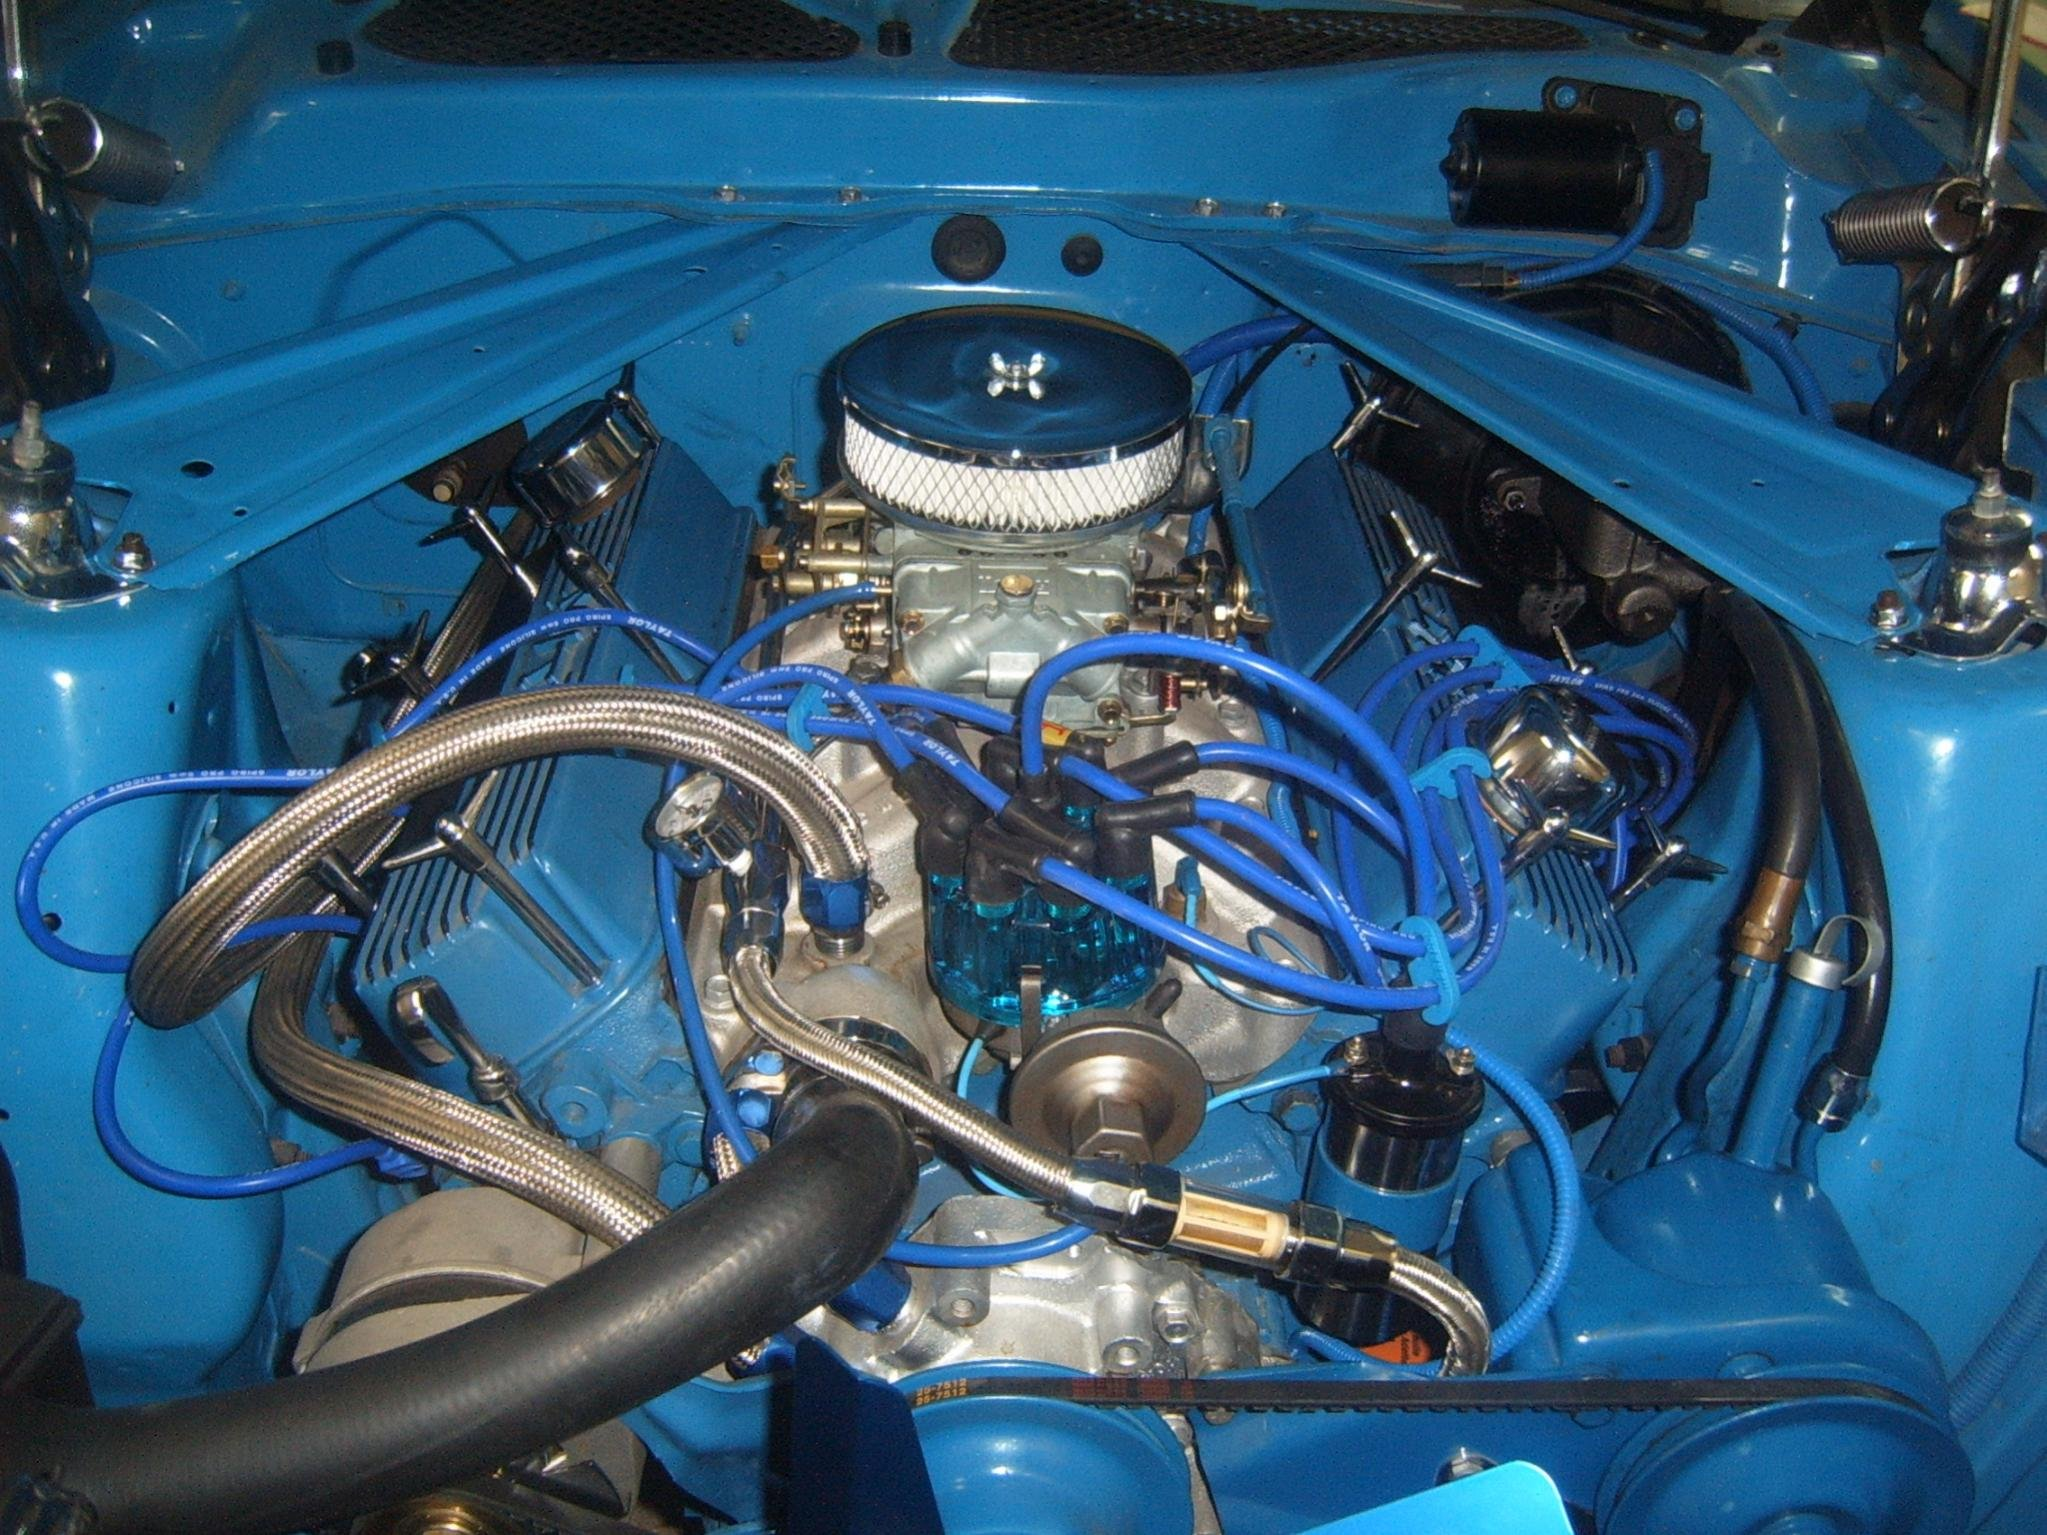 Ford 302 Firing Order >> 1971 Mustang 351W (#7 Not firing) - Ford Mustang Forum